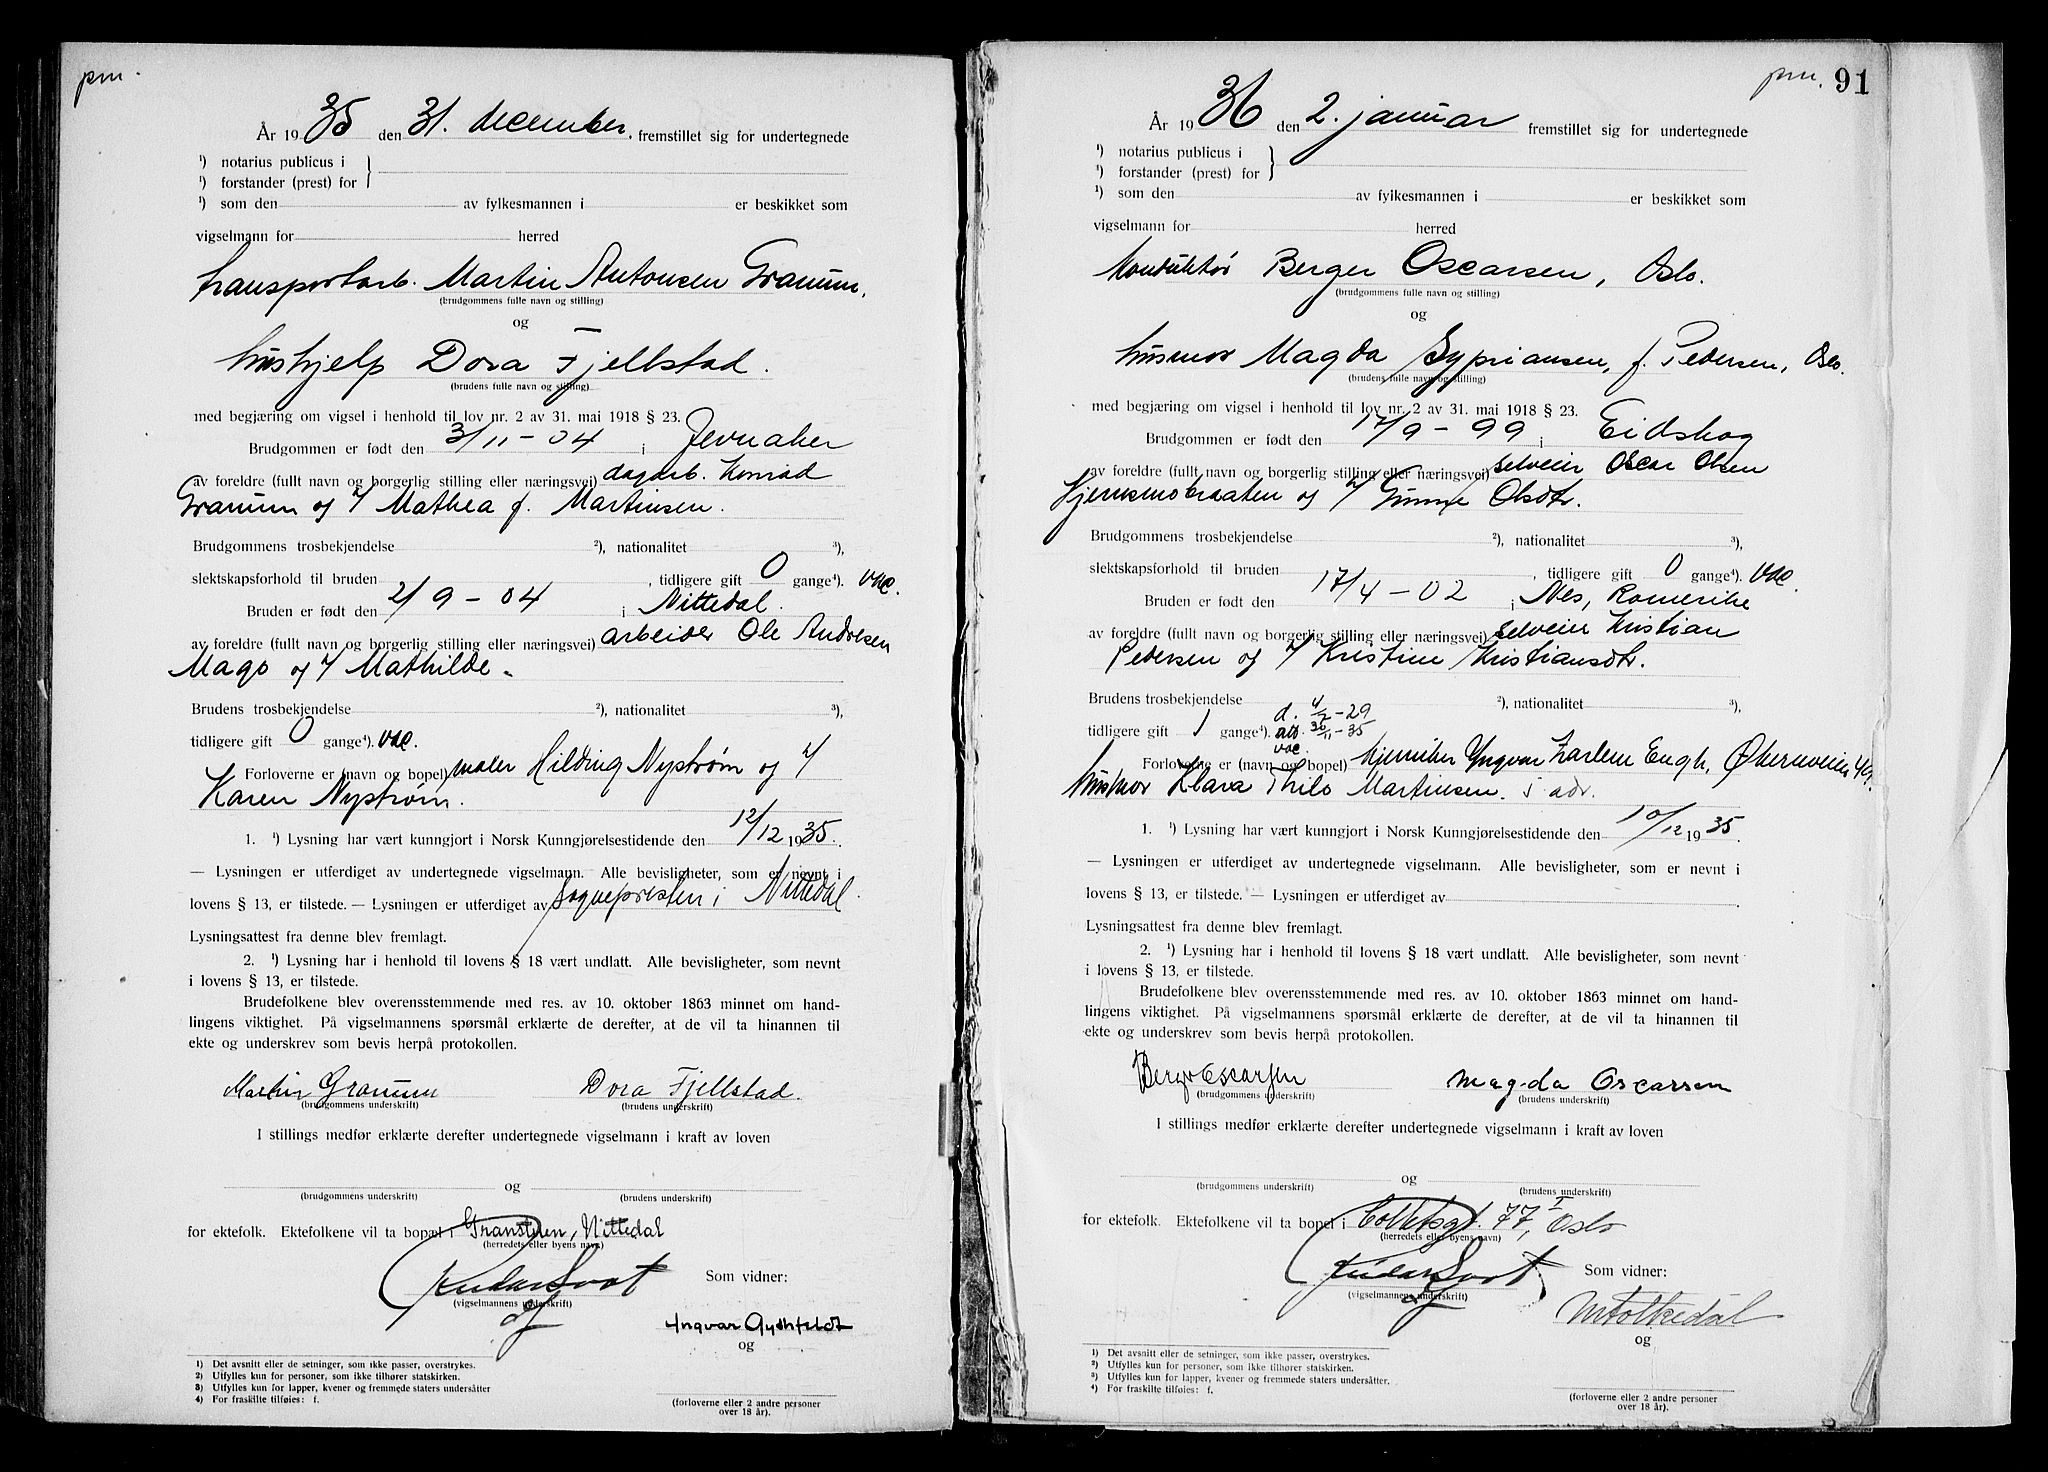 SAO, Oslo byfogd avd. I, L/Lb/Lbb/L0025: Notarialprotokoll, rekke II: Vigsler, 1935-1936, s. 90b-91a